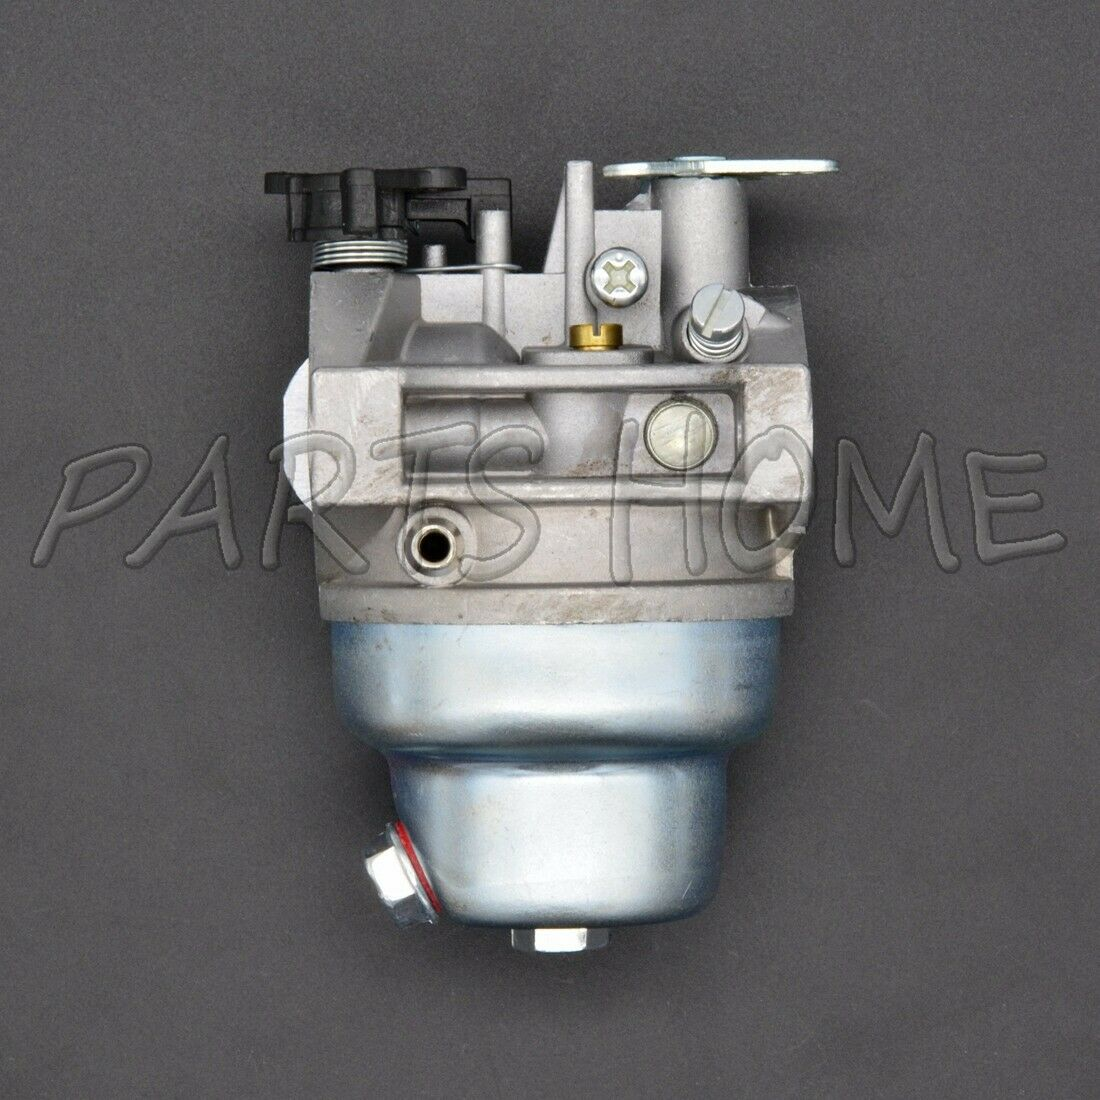 Simpson Model 60583 3000 PSI 2.4 GPM Pressure Washer Carburetor Carb